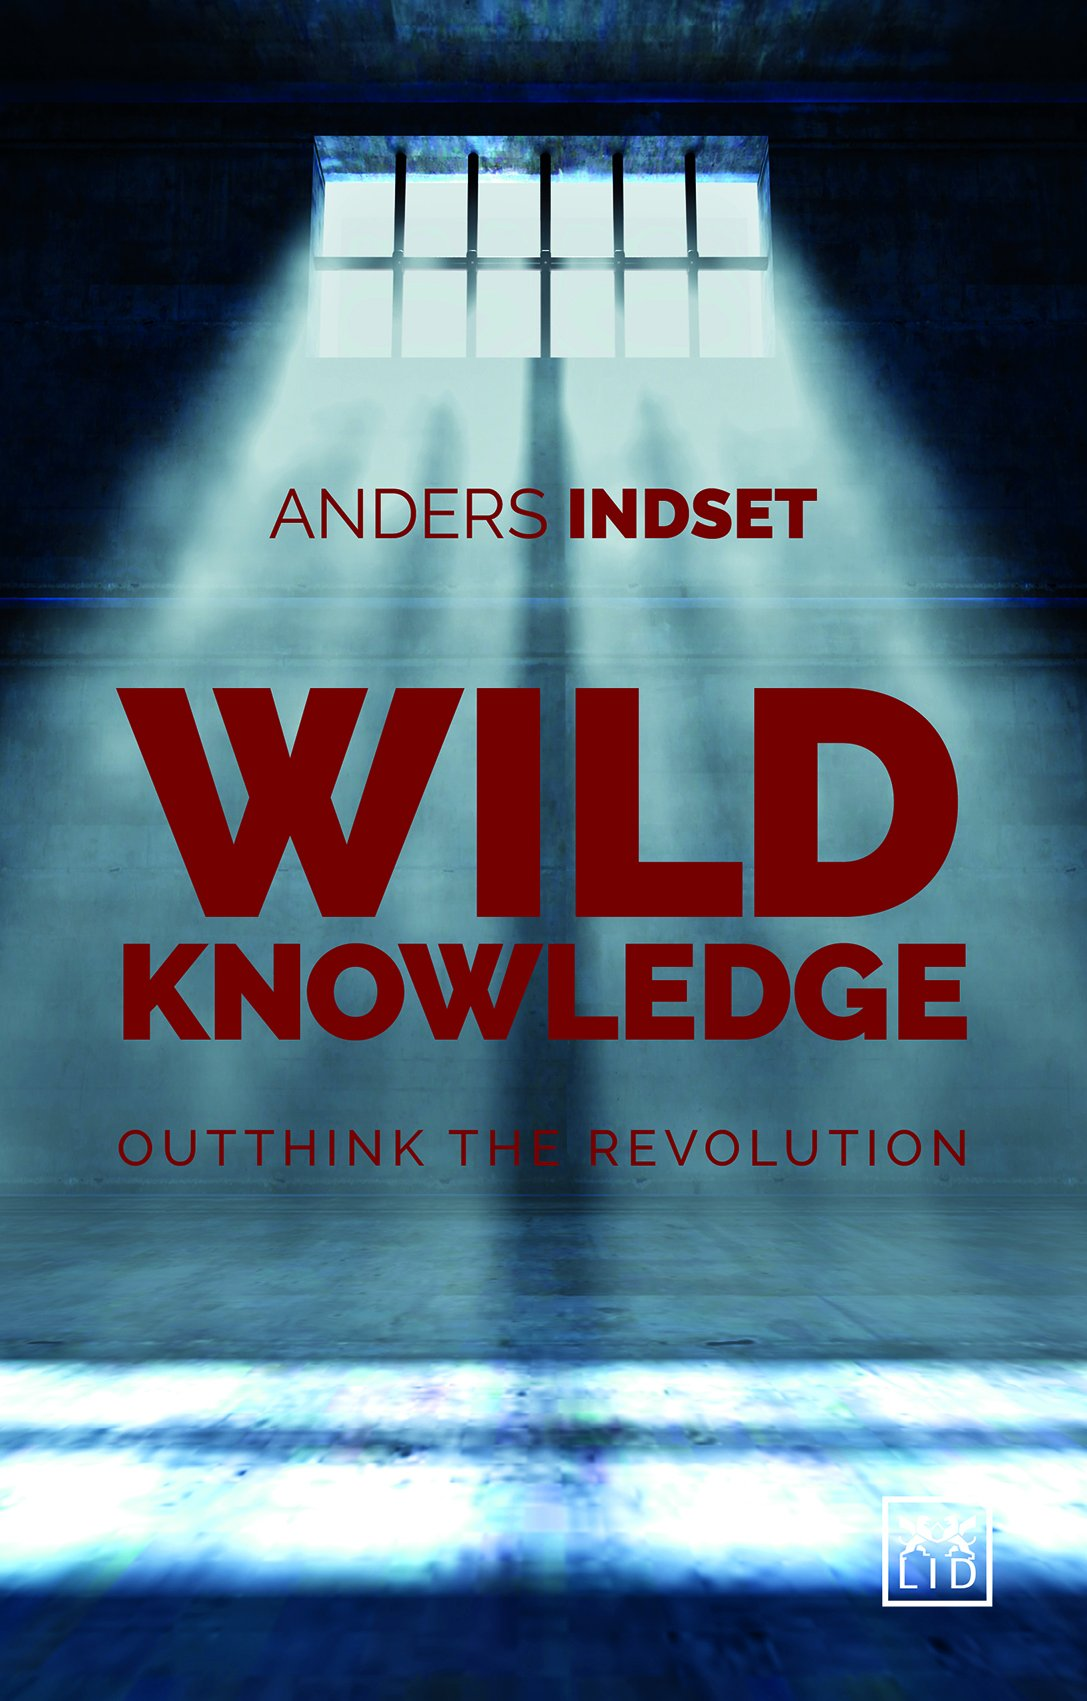 Wild Knowledge: Outthink the Revolution: Amazon.de: Anders Indset:  Fremdsprachige Bücher